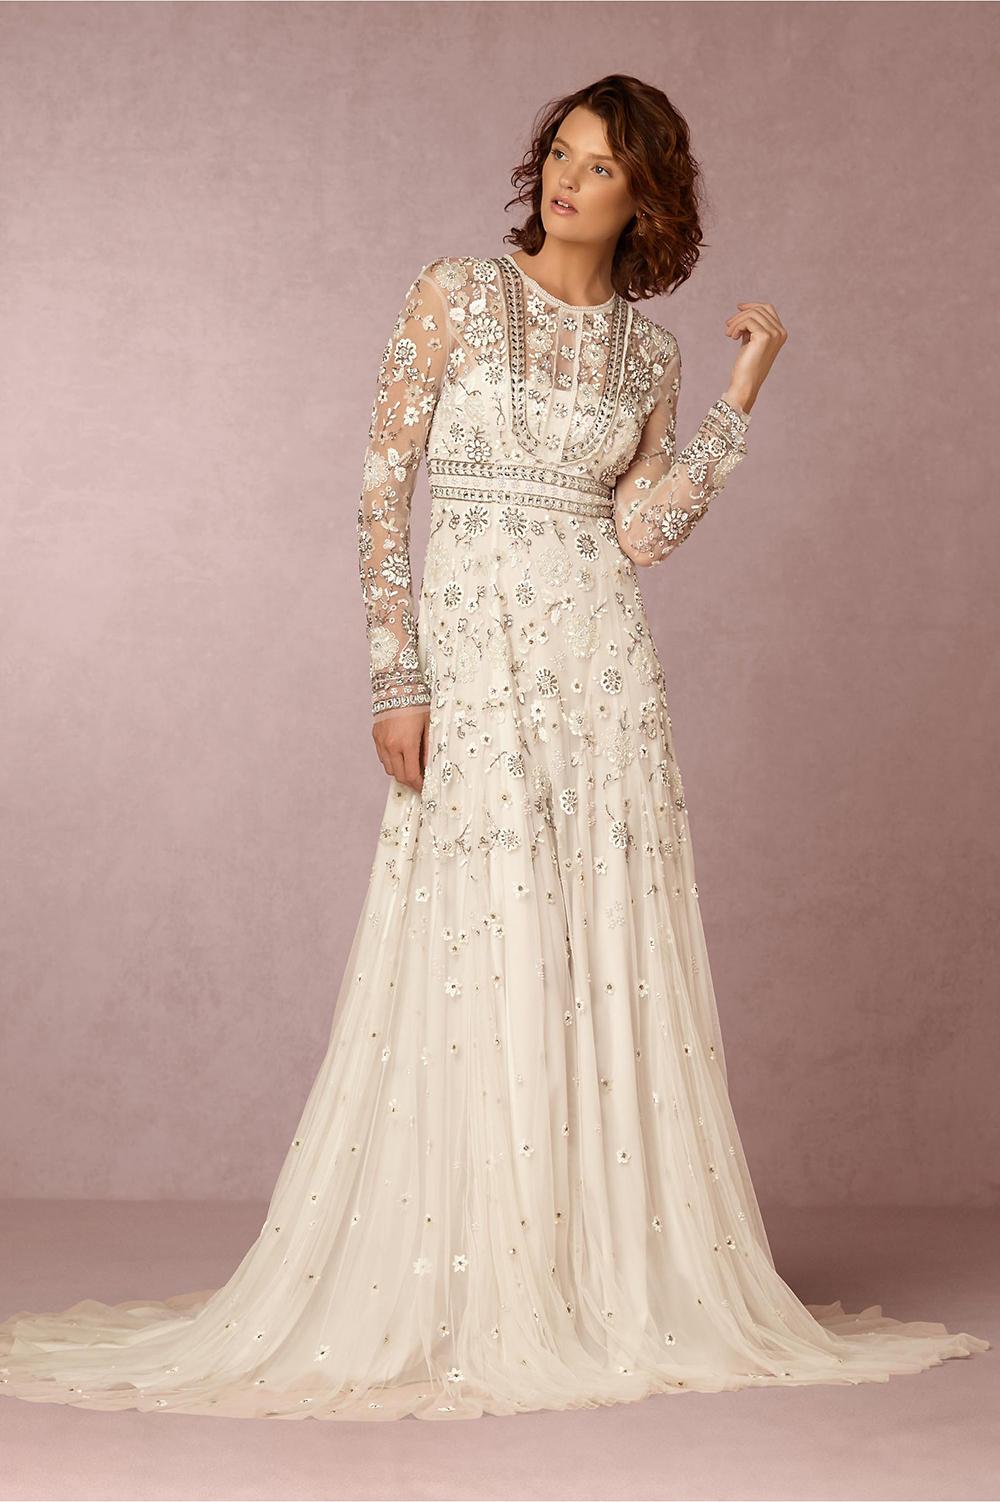 BHLDN Tabitha Gown - BHLDN Wedding Gowns